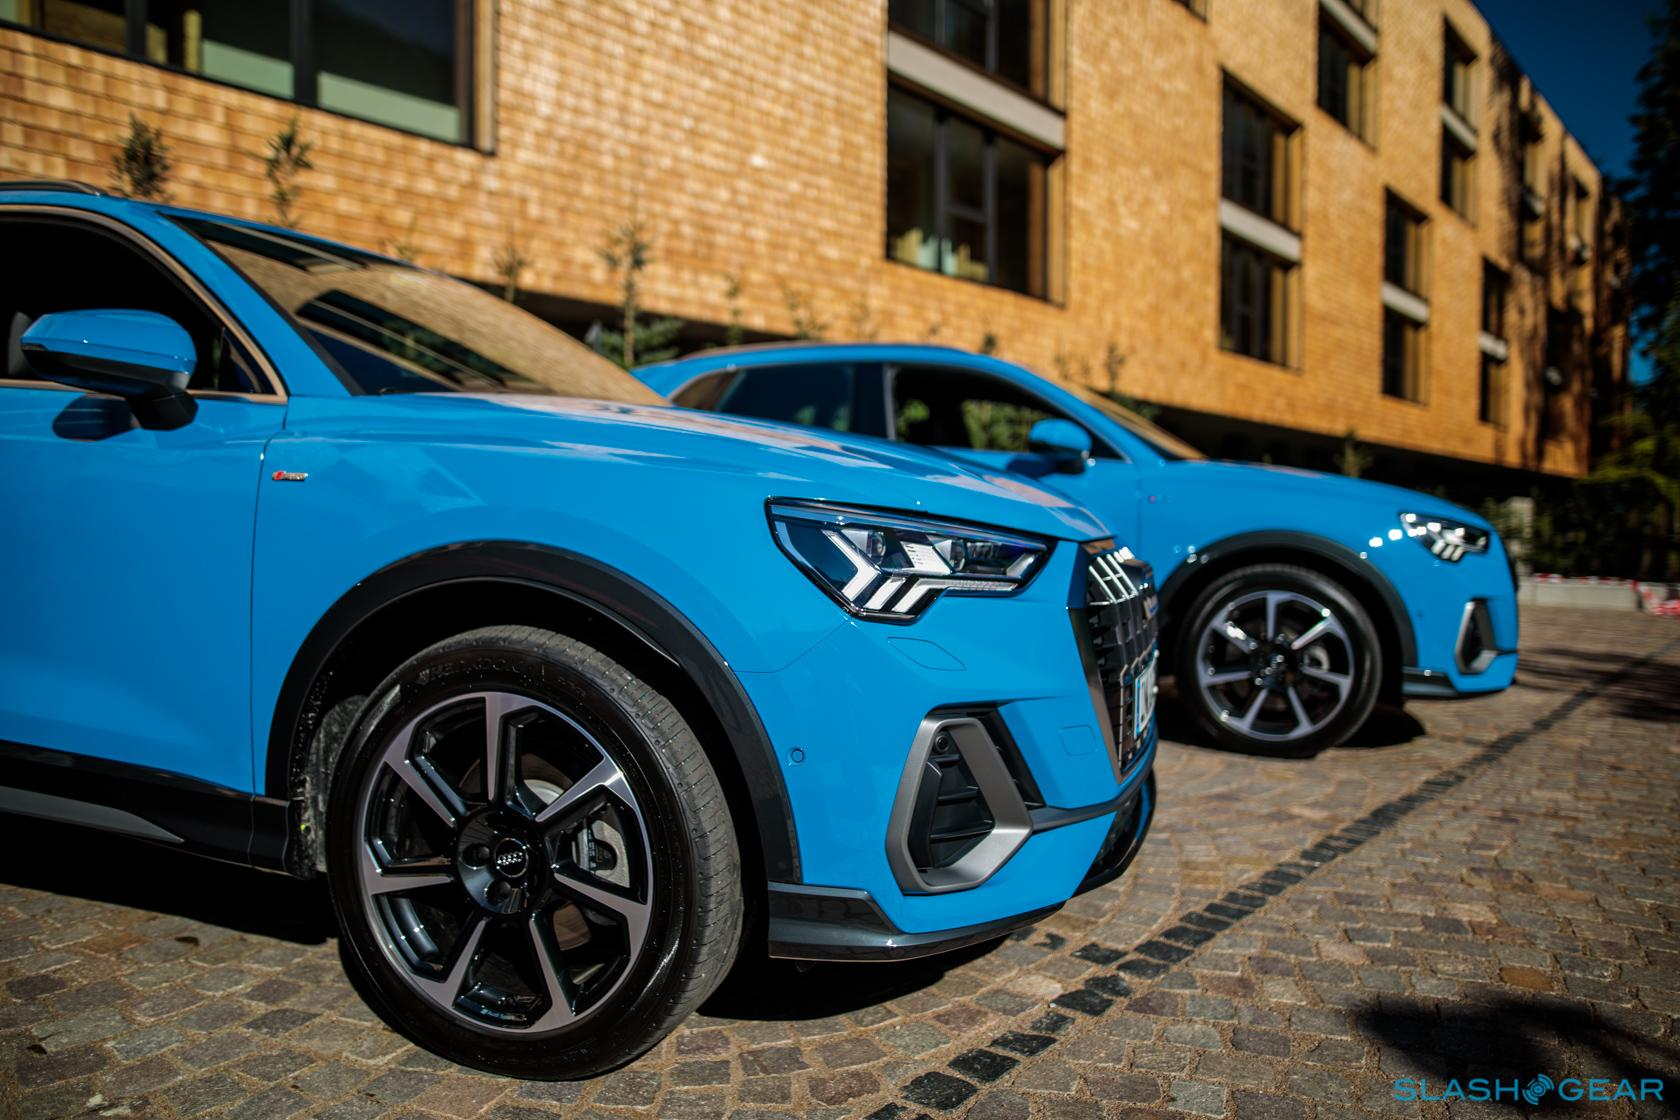 2019 Audi Q3 Gallery - SlashGear